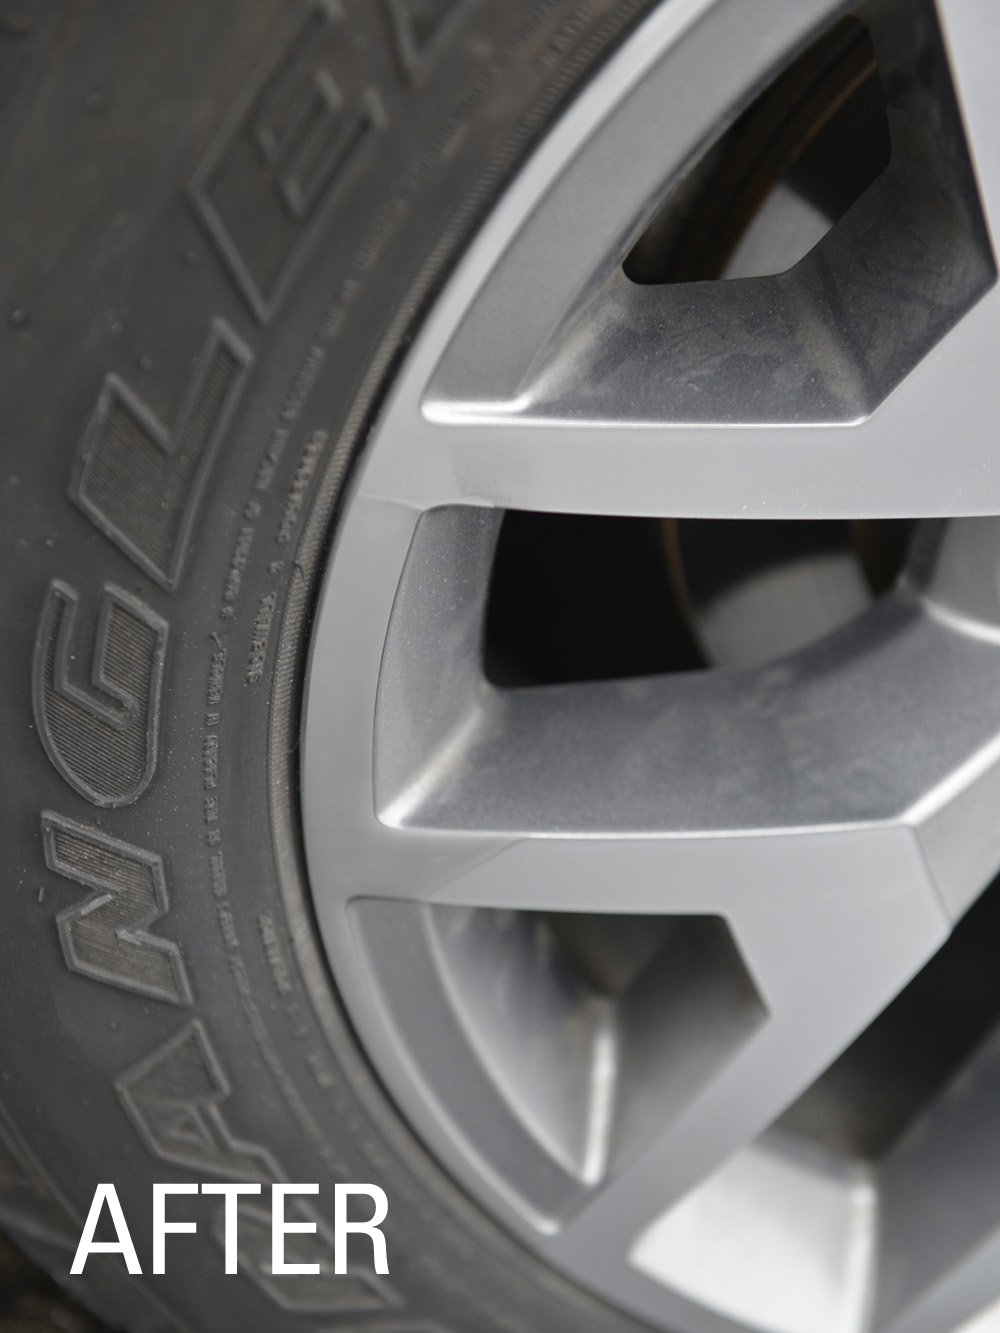 Rim Replacement Cost : replacement, Refinishing, Wheel, Repair, Hamilton,, Ancaster,, Dundas,, Stoney, Creek,, Grimsby, Tirehaus, Tires